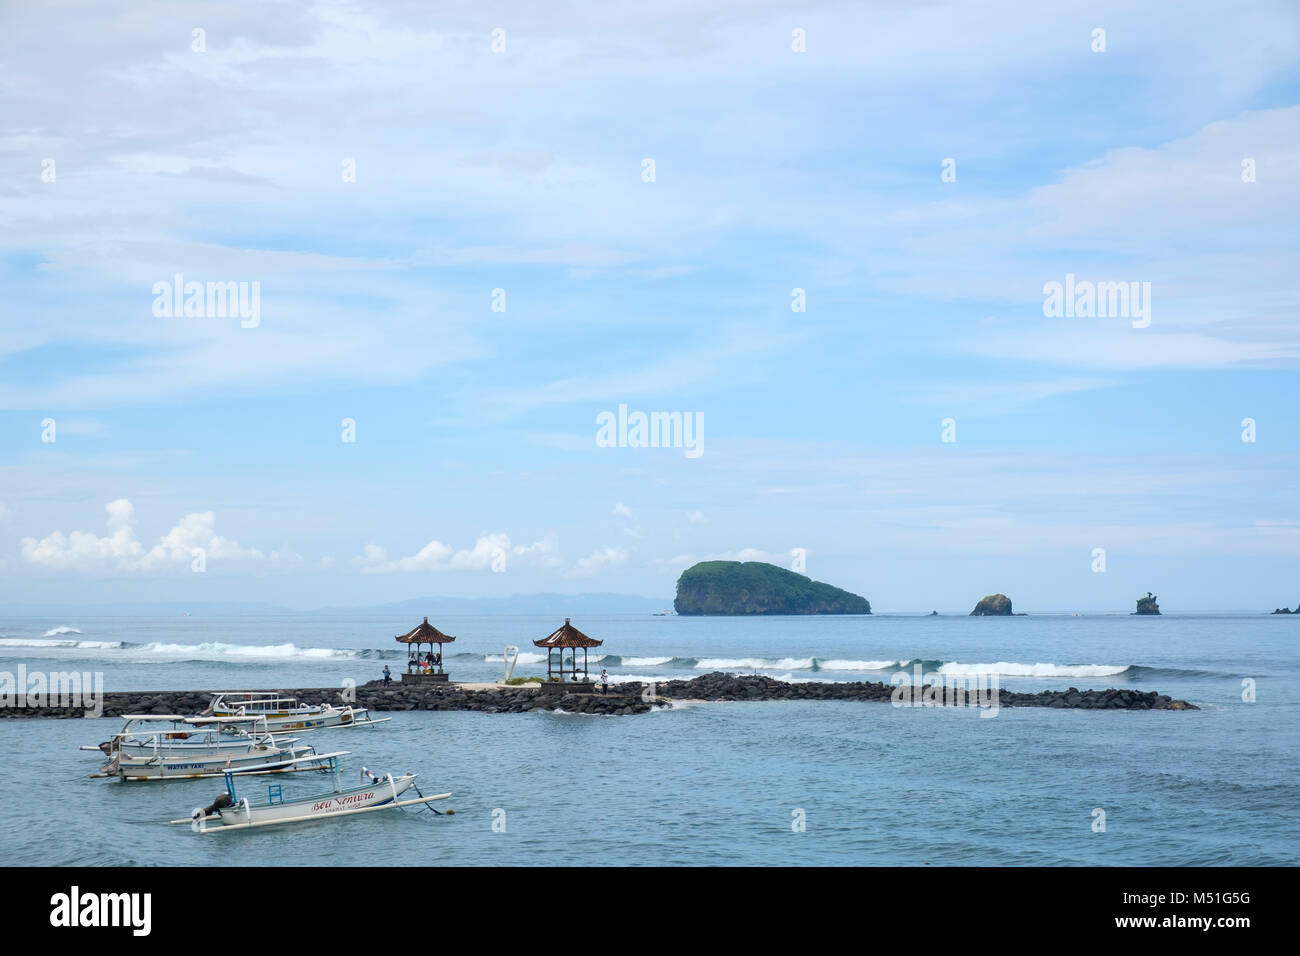 View from Candi Dasa (or Candidasa) beach, Bali, Indonesia. - Stock Image